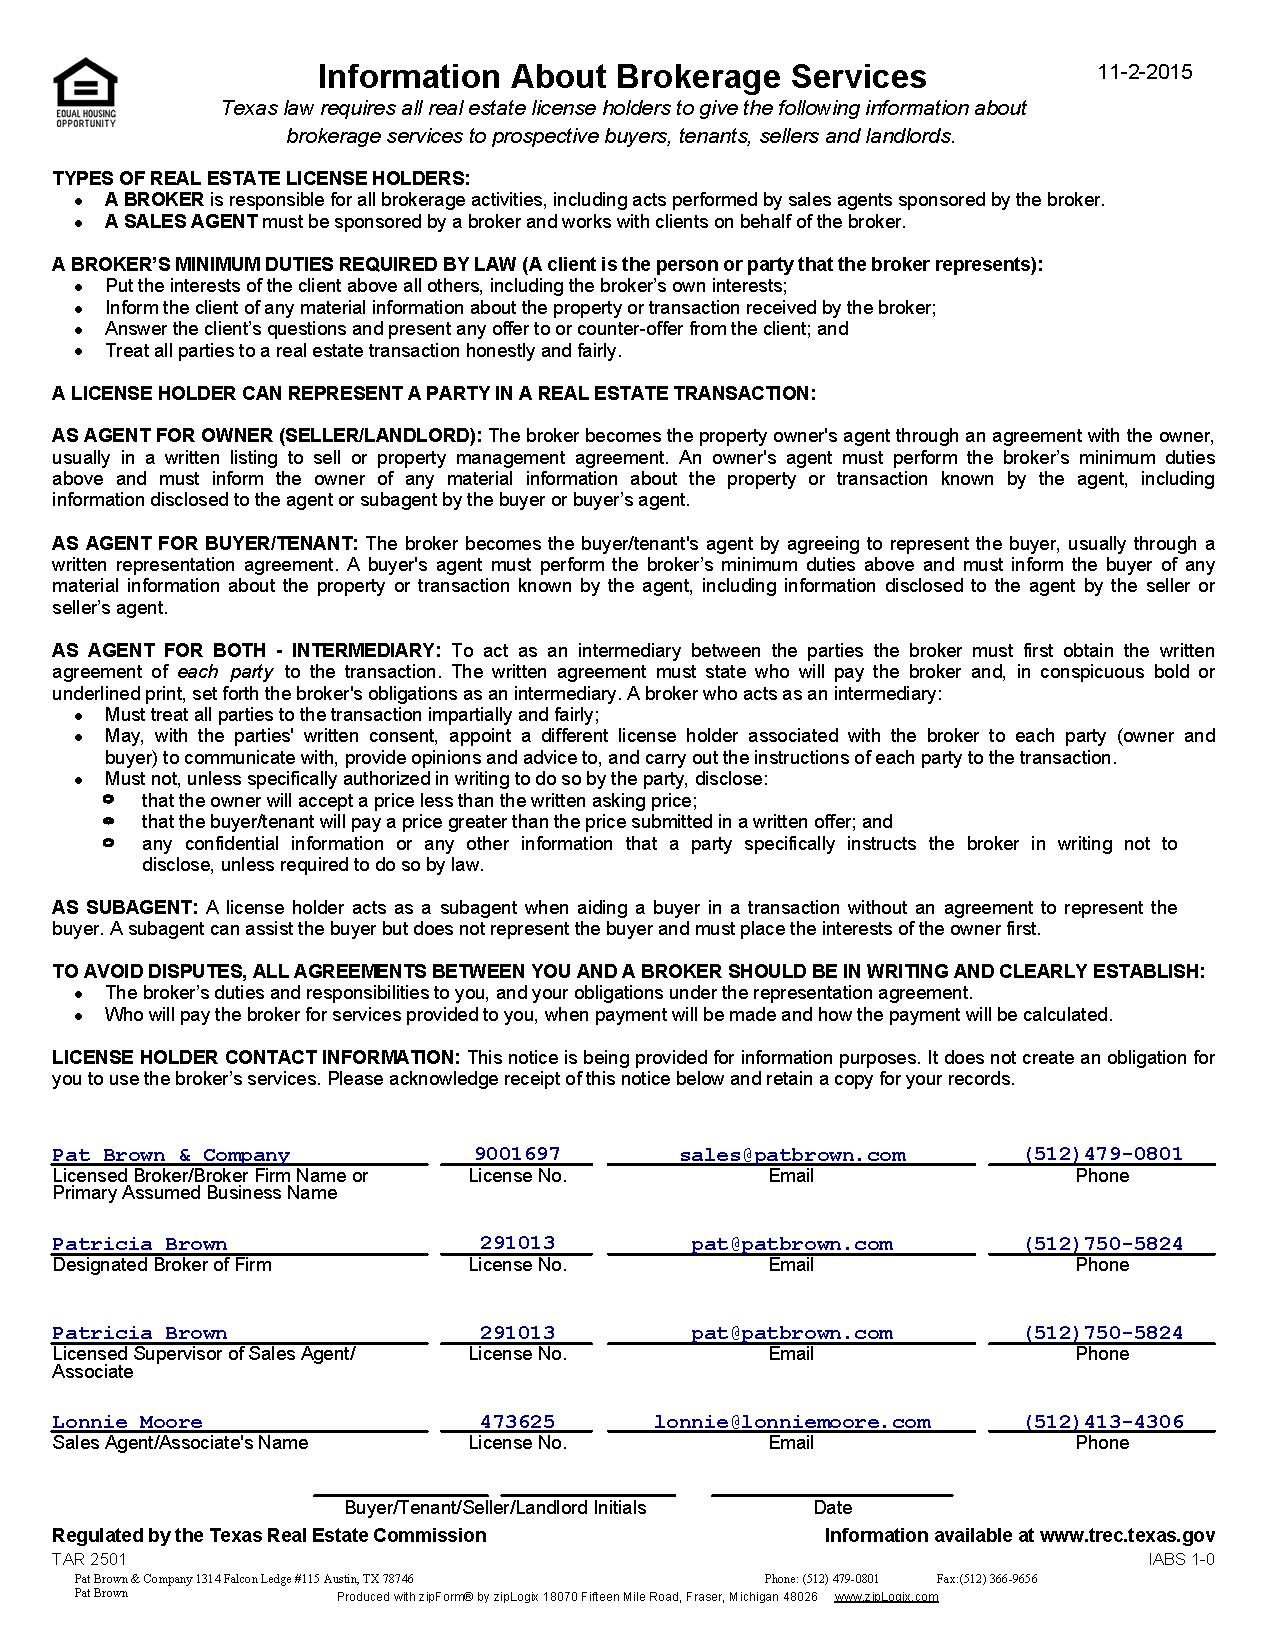 InfoBrokerageServices-PBC-2016